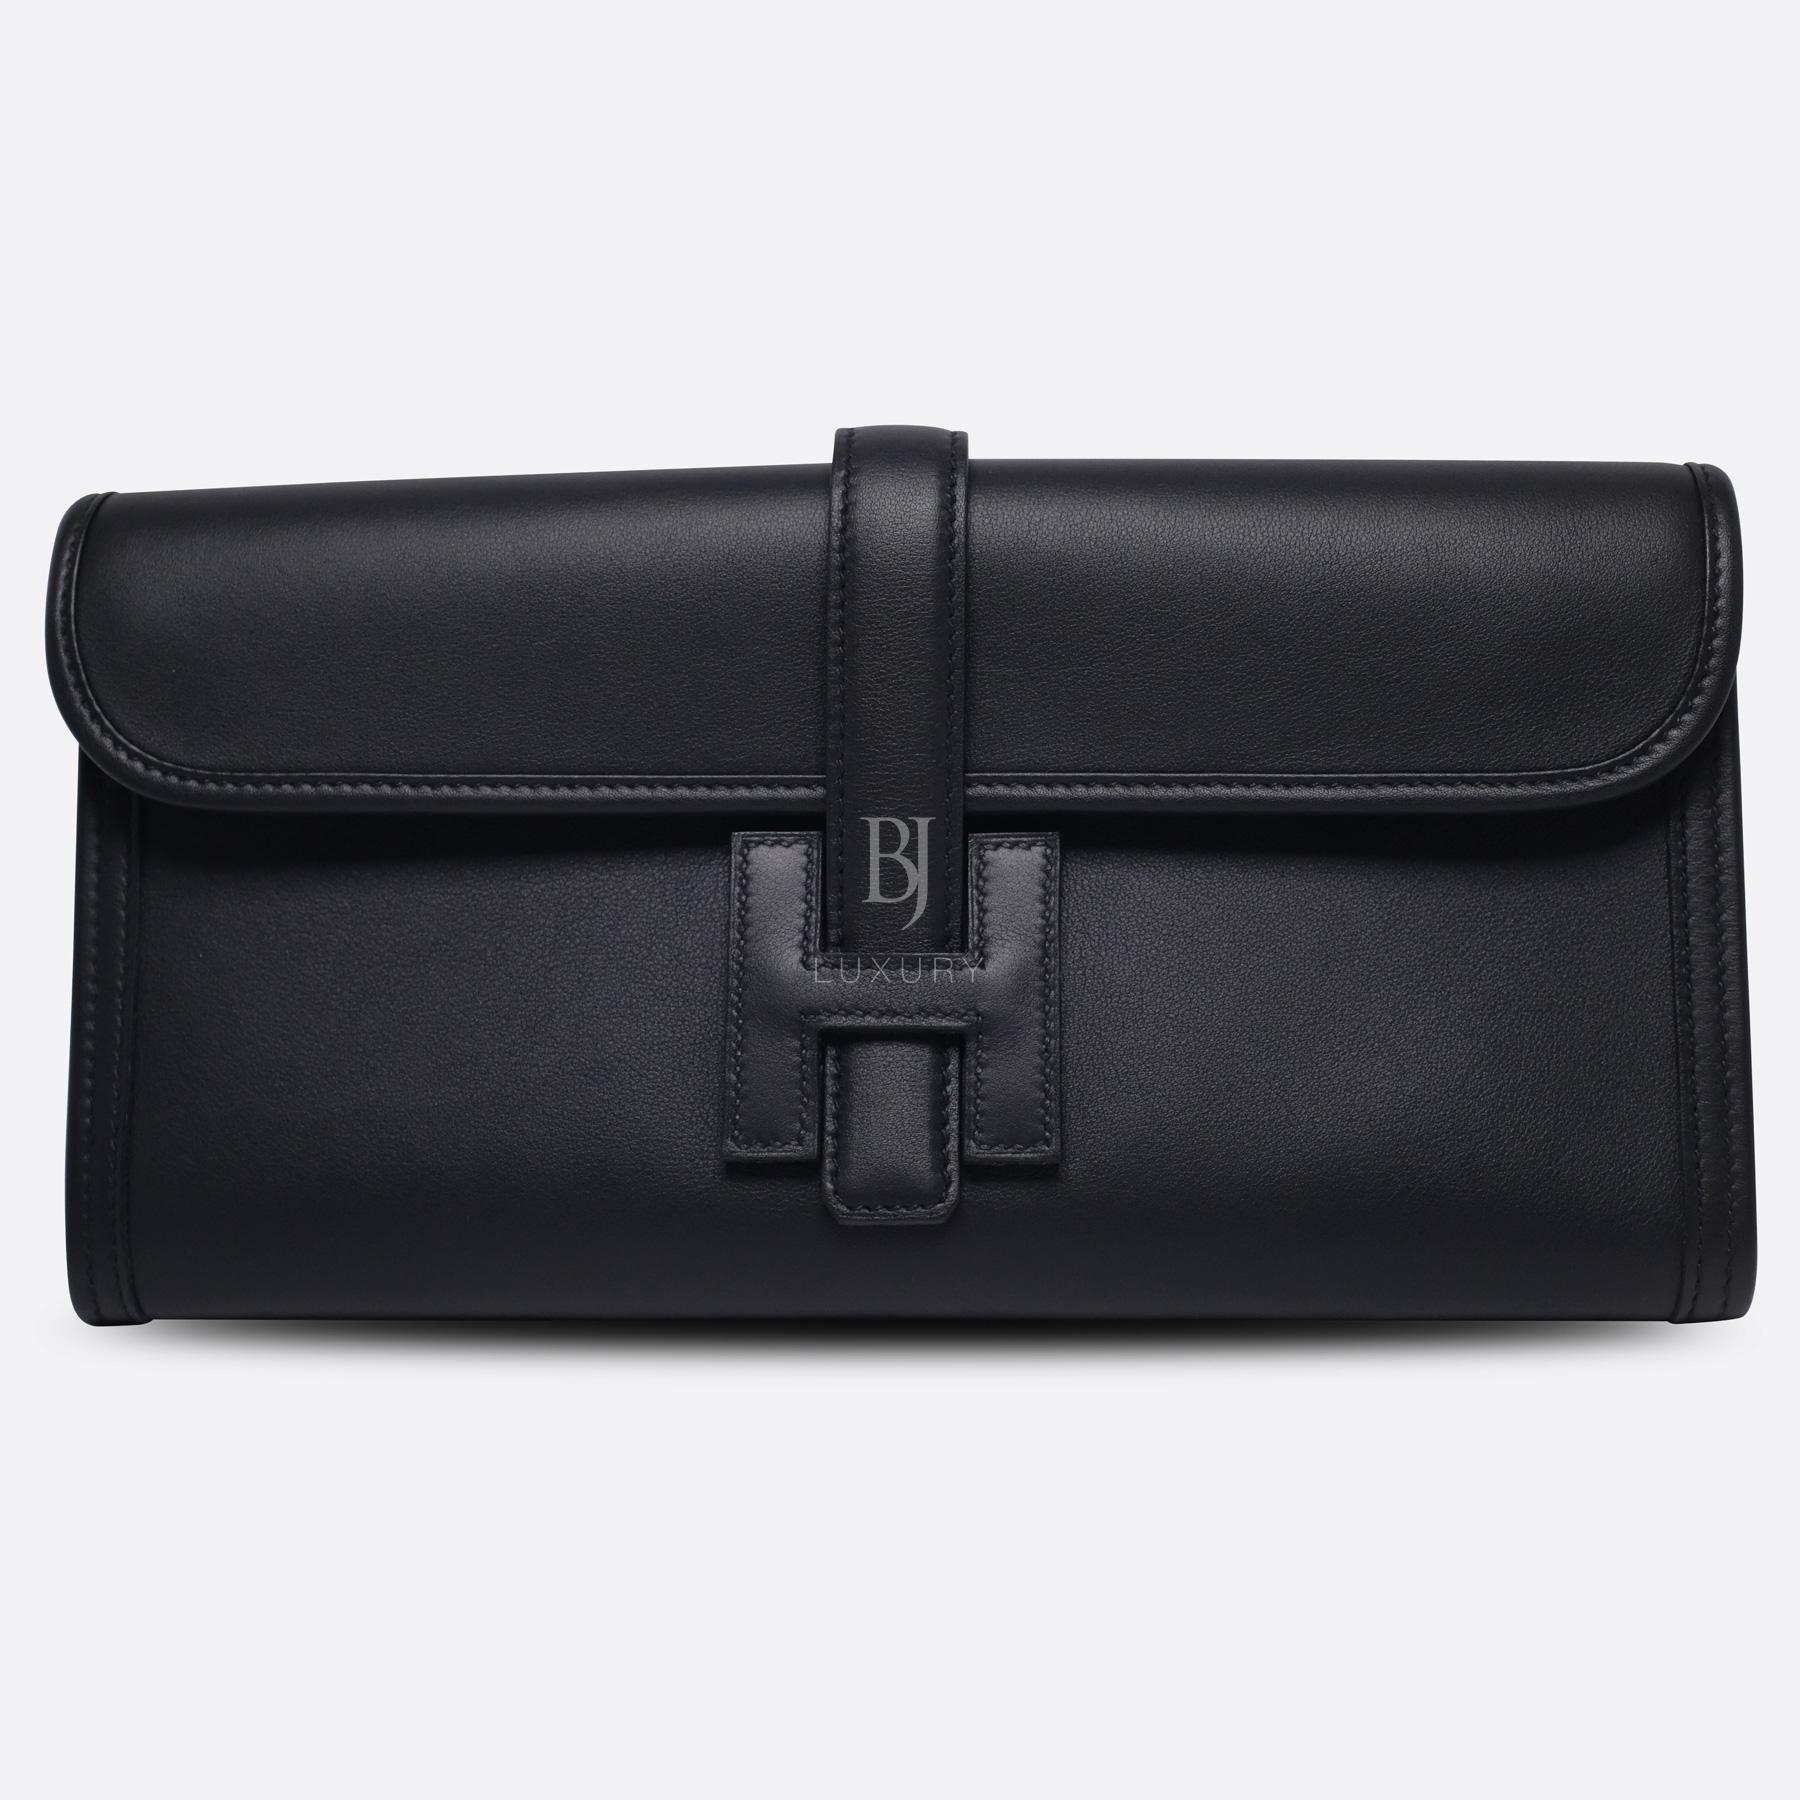 Hermes Jige 29 Black Swift BJ Luxury 1.jpg